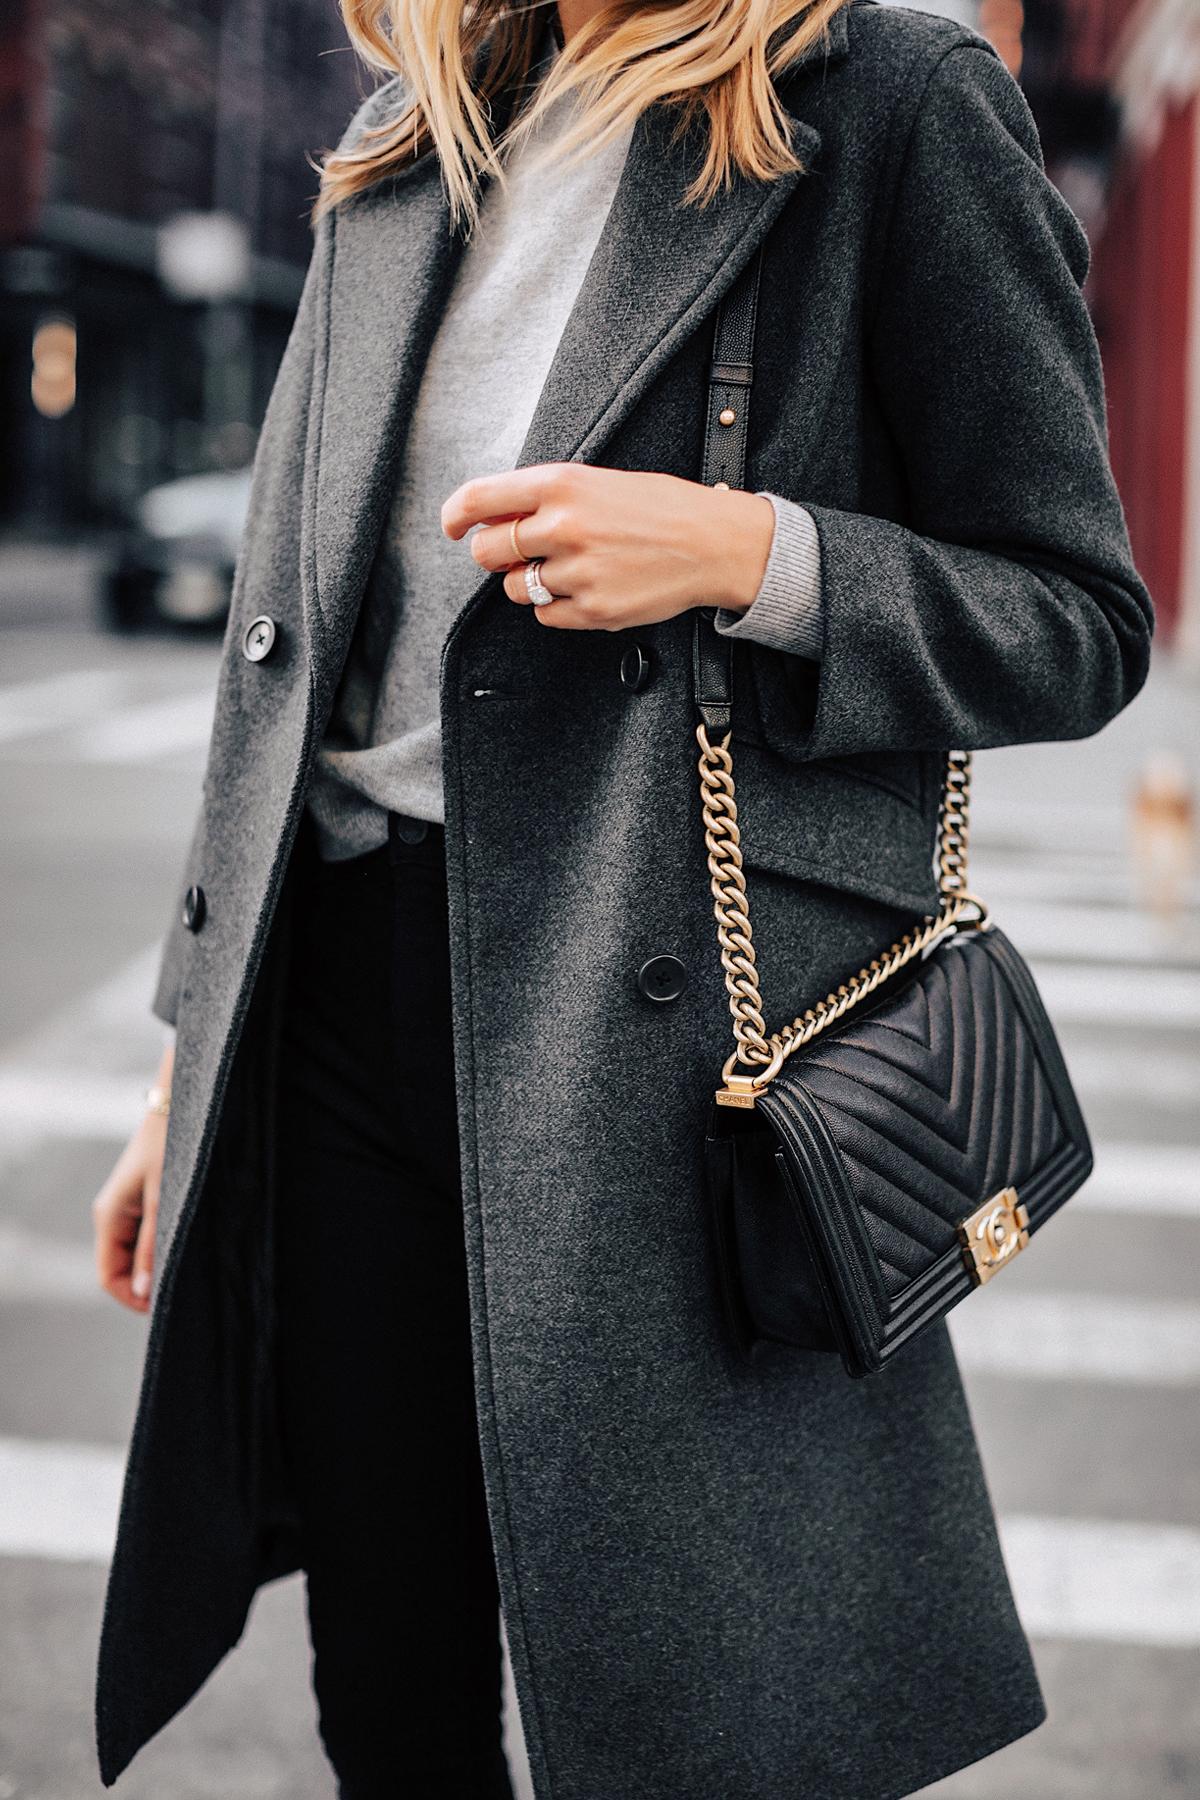 Fashion Jackson Wearing Grey Everlane Wool Overcoat Grey Sweater Black Chanel Boy Bag